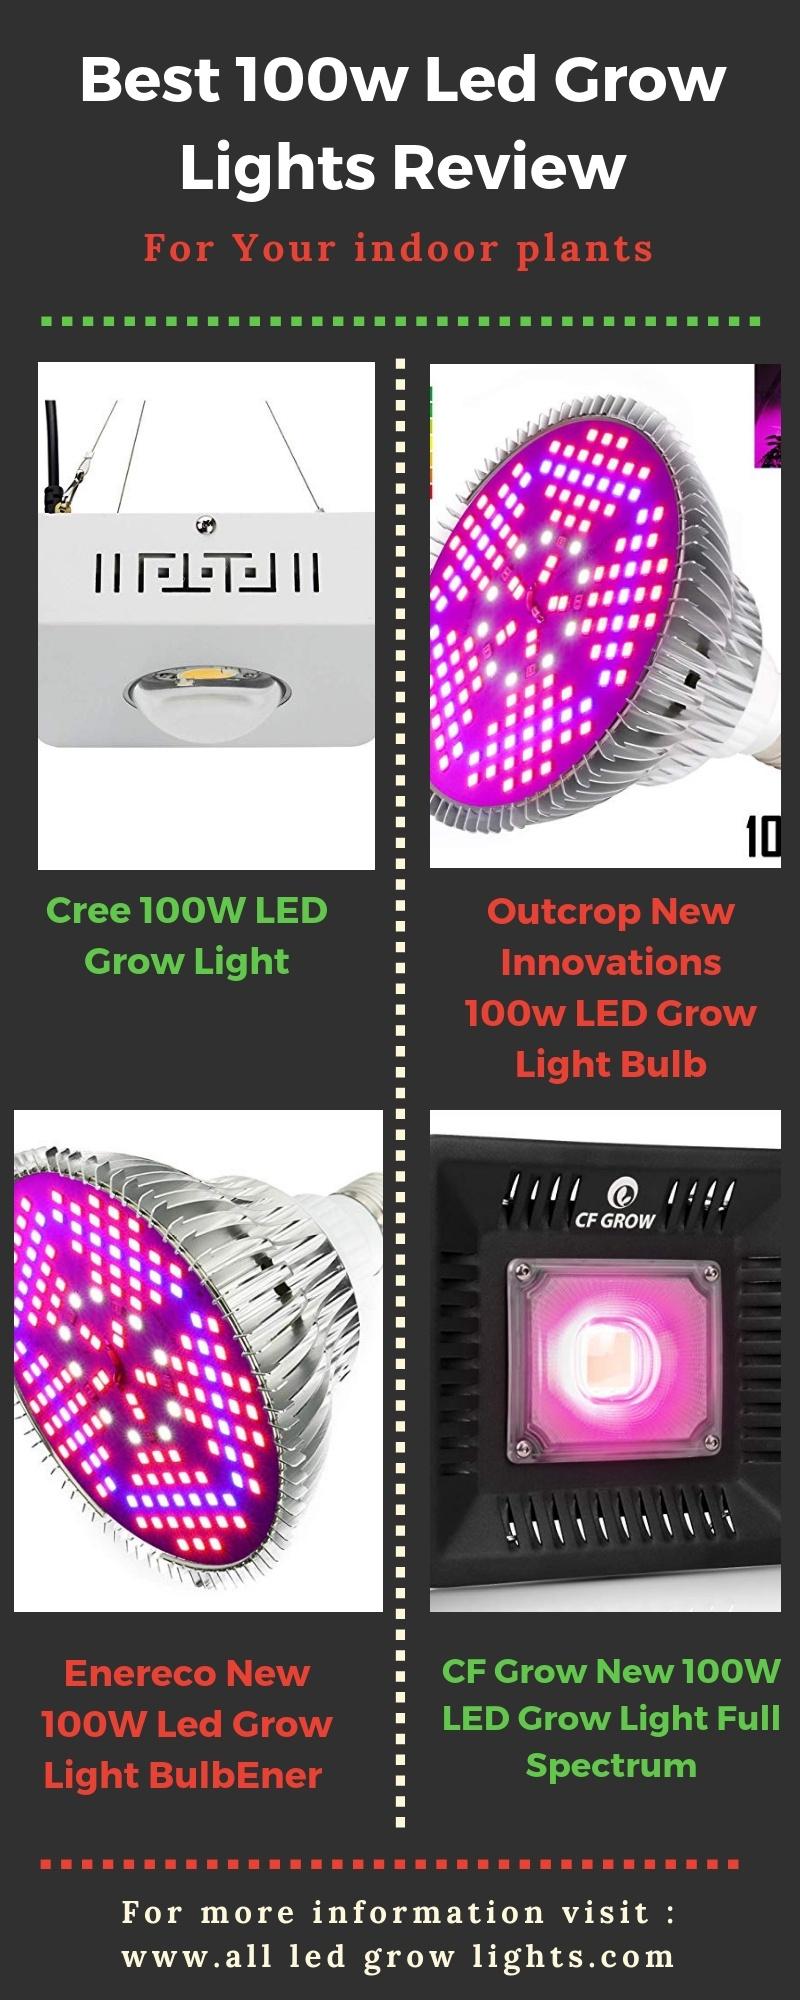 best 100w led grow light info graphics